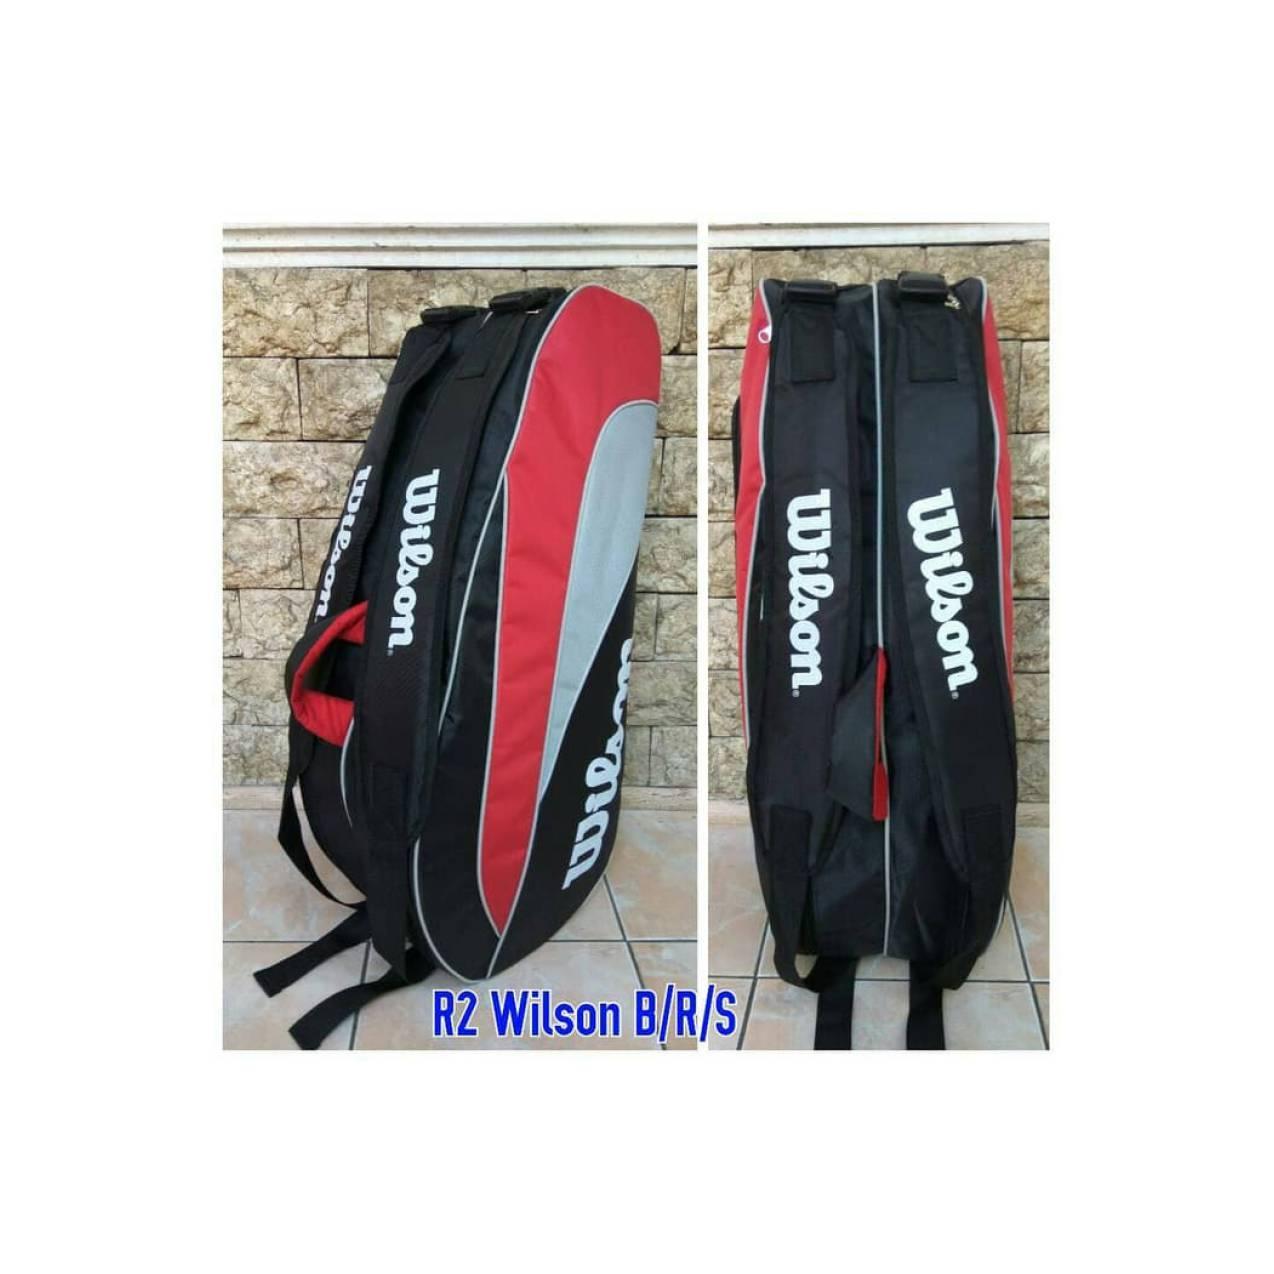 #k47 New Original Tas raket tenis wilson